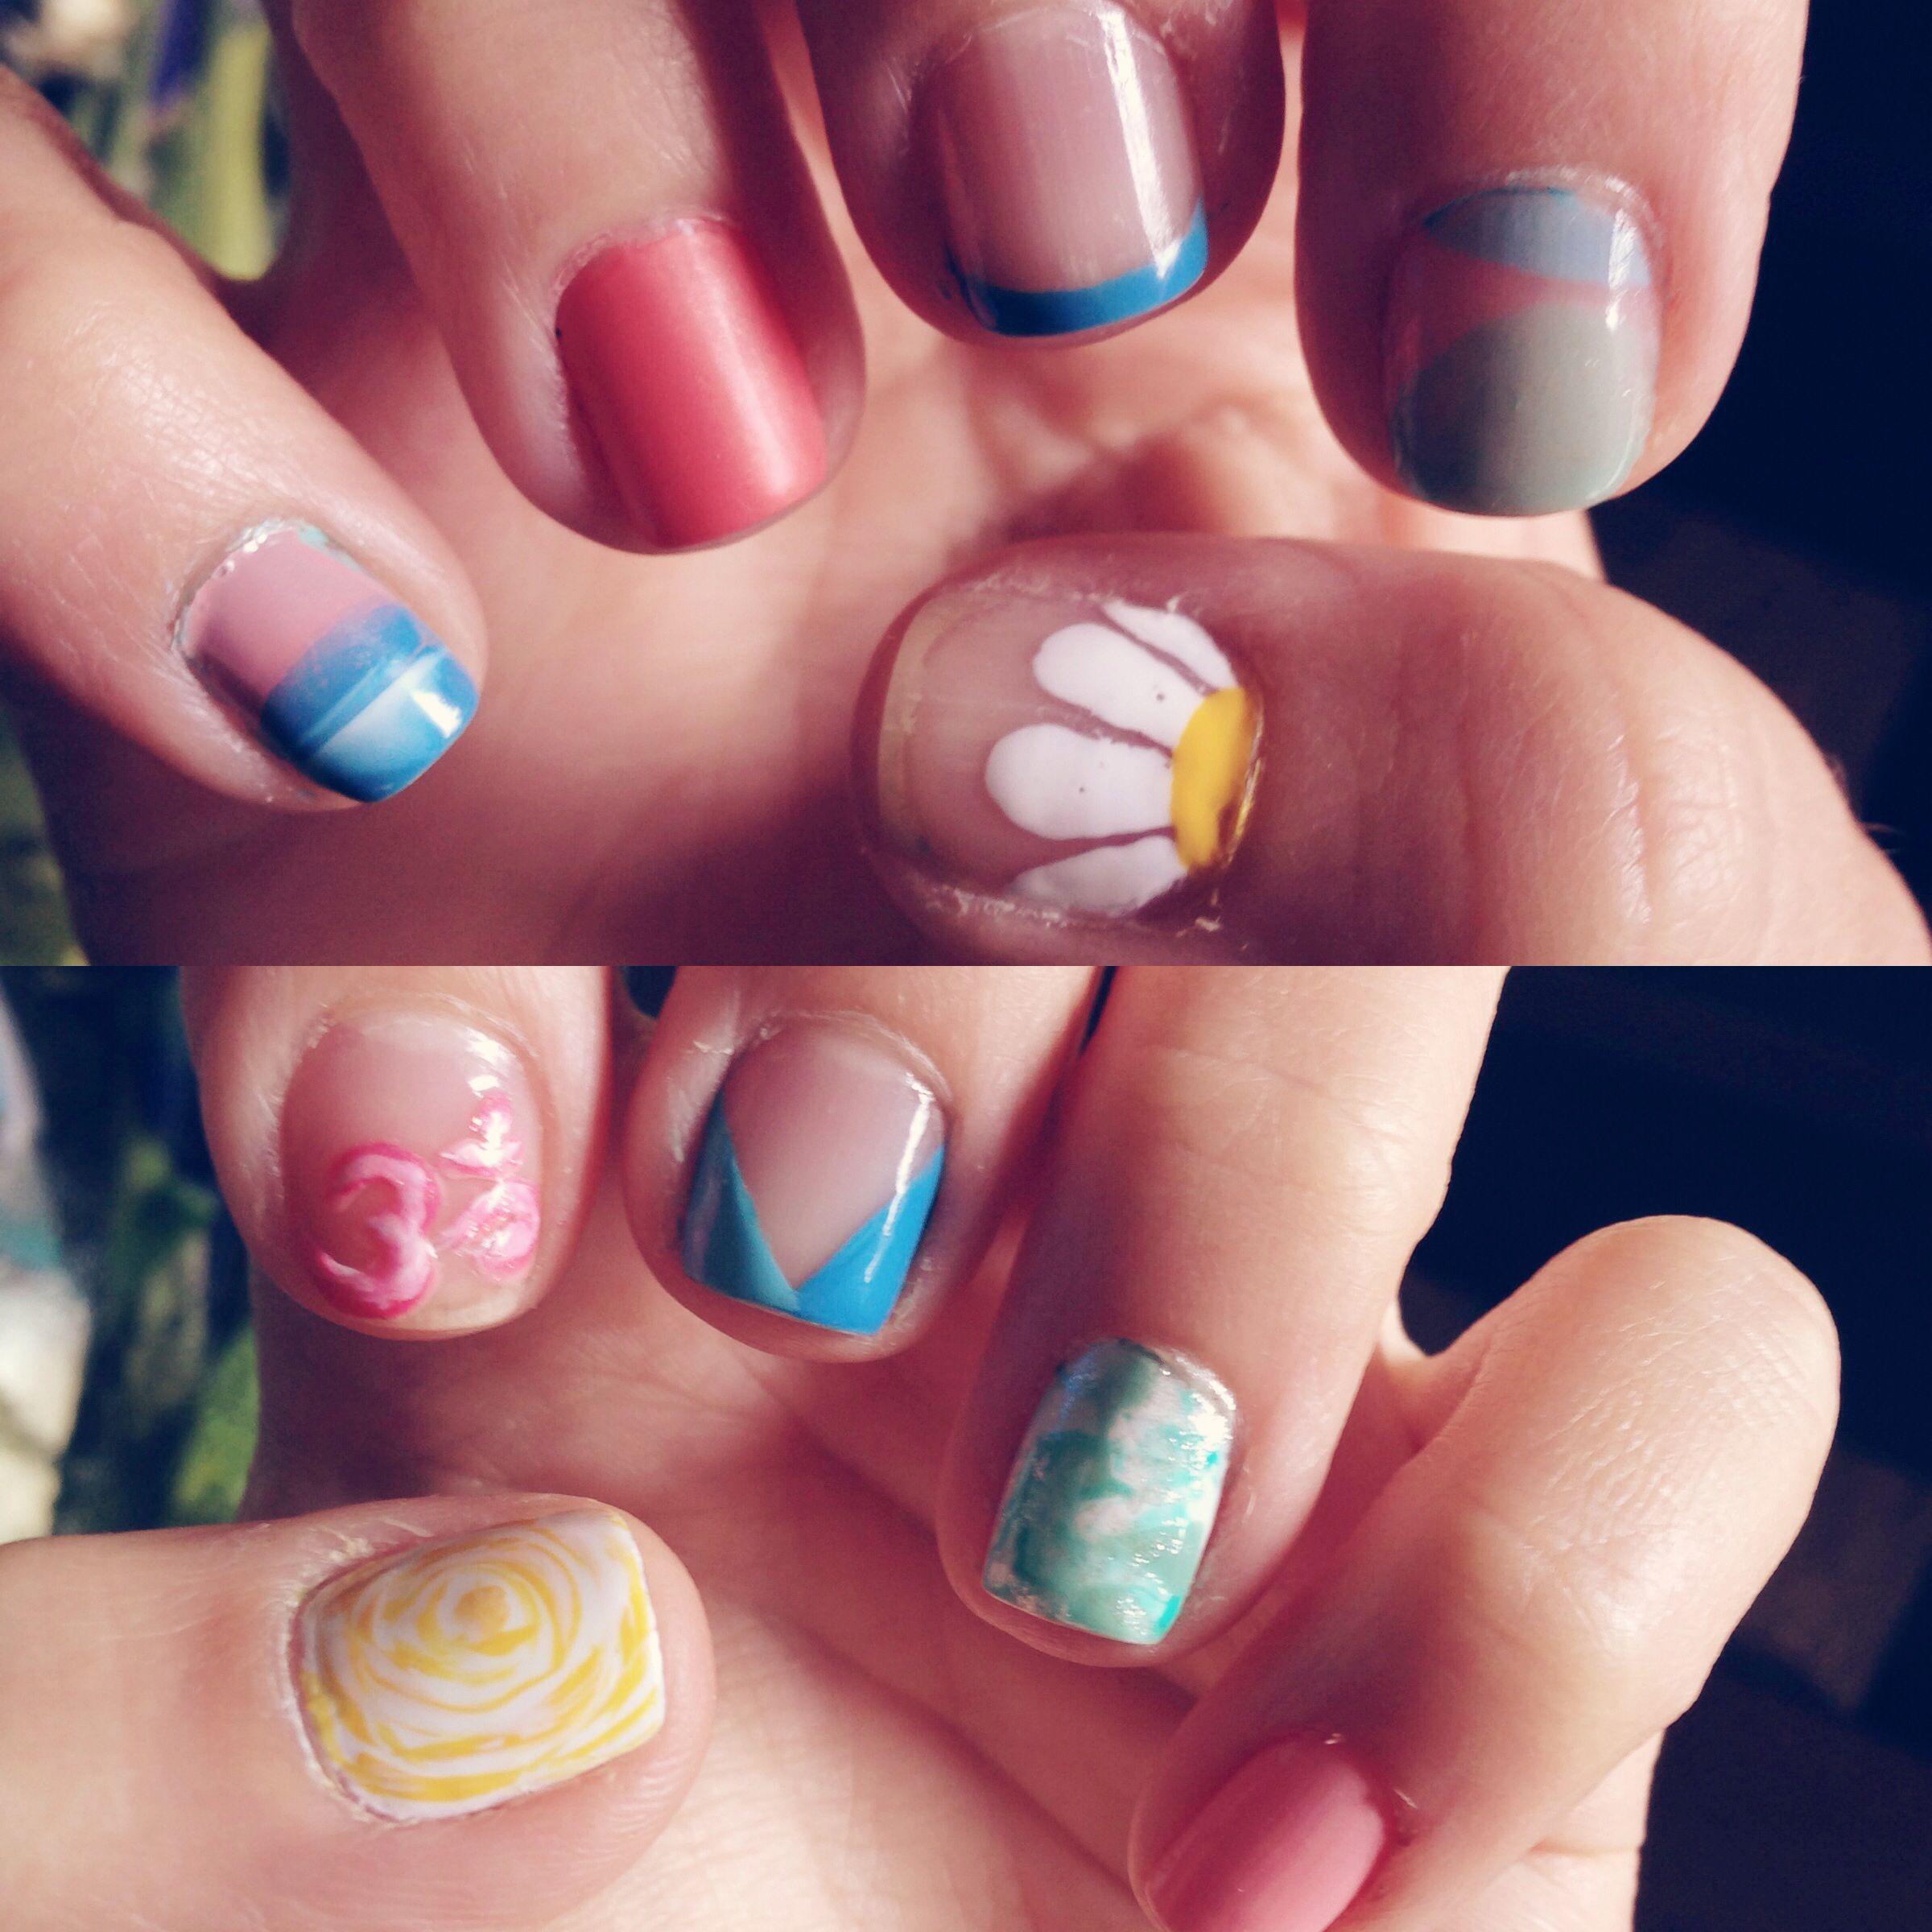 om nail art #daisy water marbling | Nails ♡ | Pinterest | Water ...